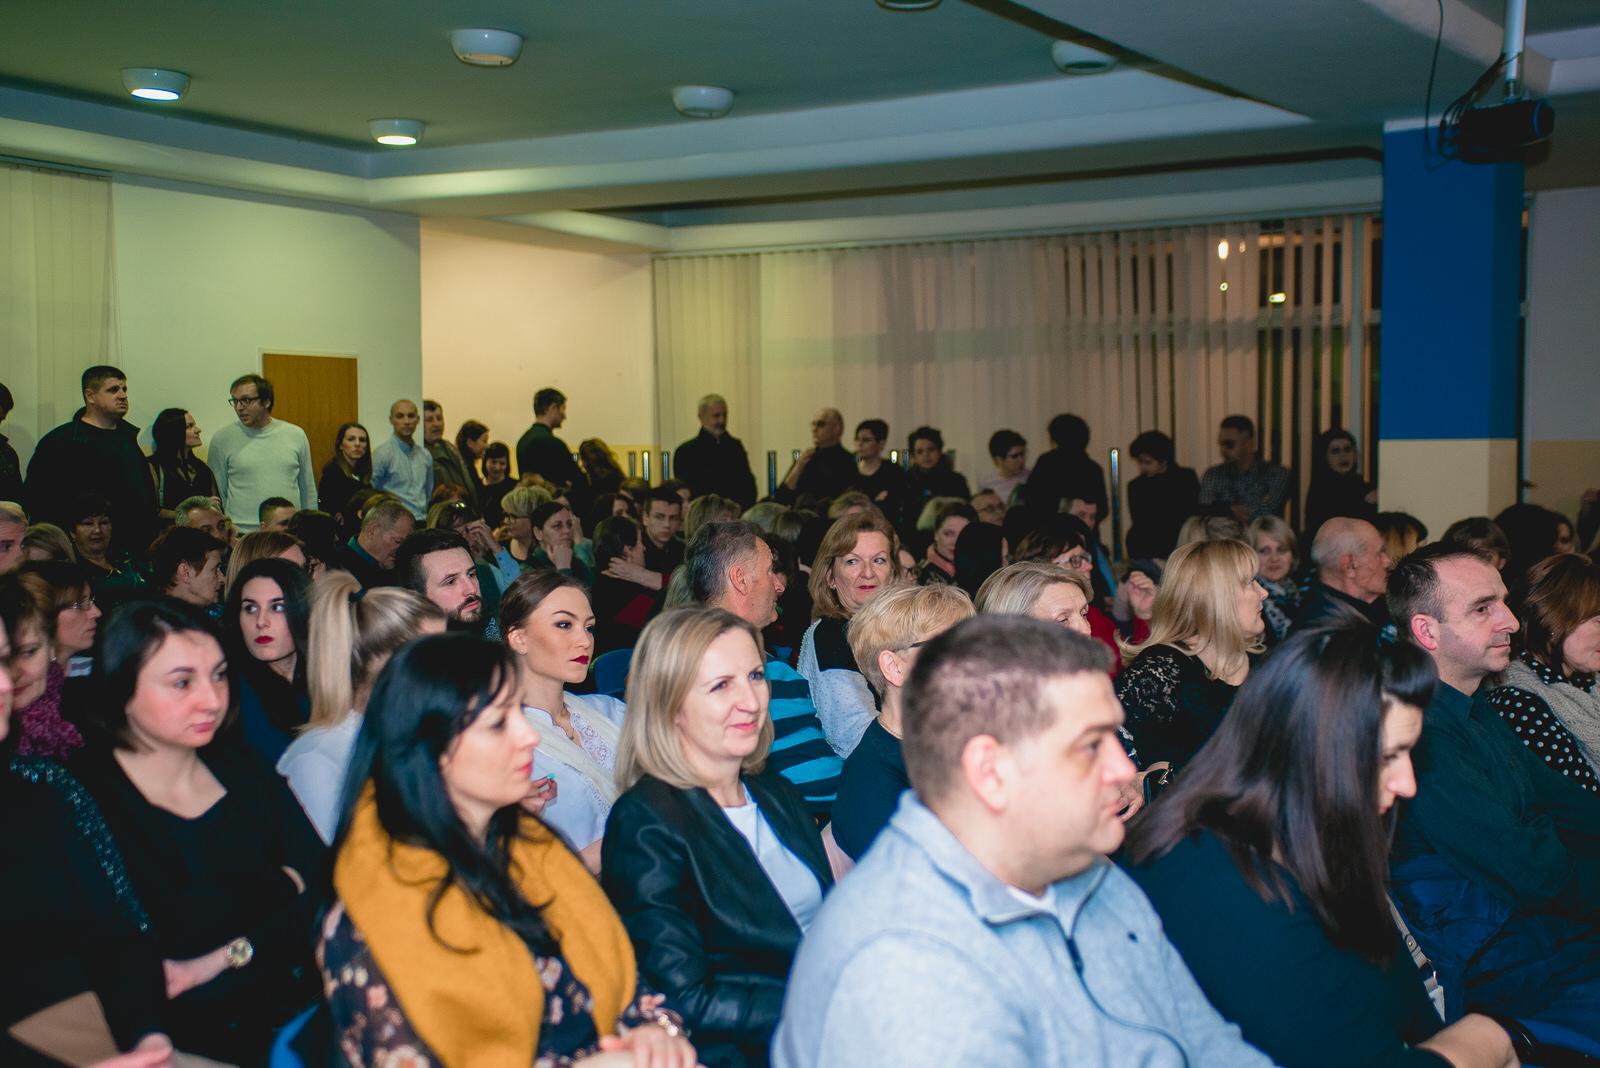 likaclub_koncert-klapa-cambi_kic-gospić_2019-3